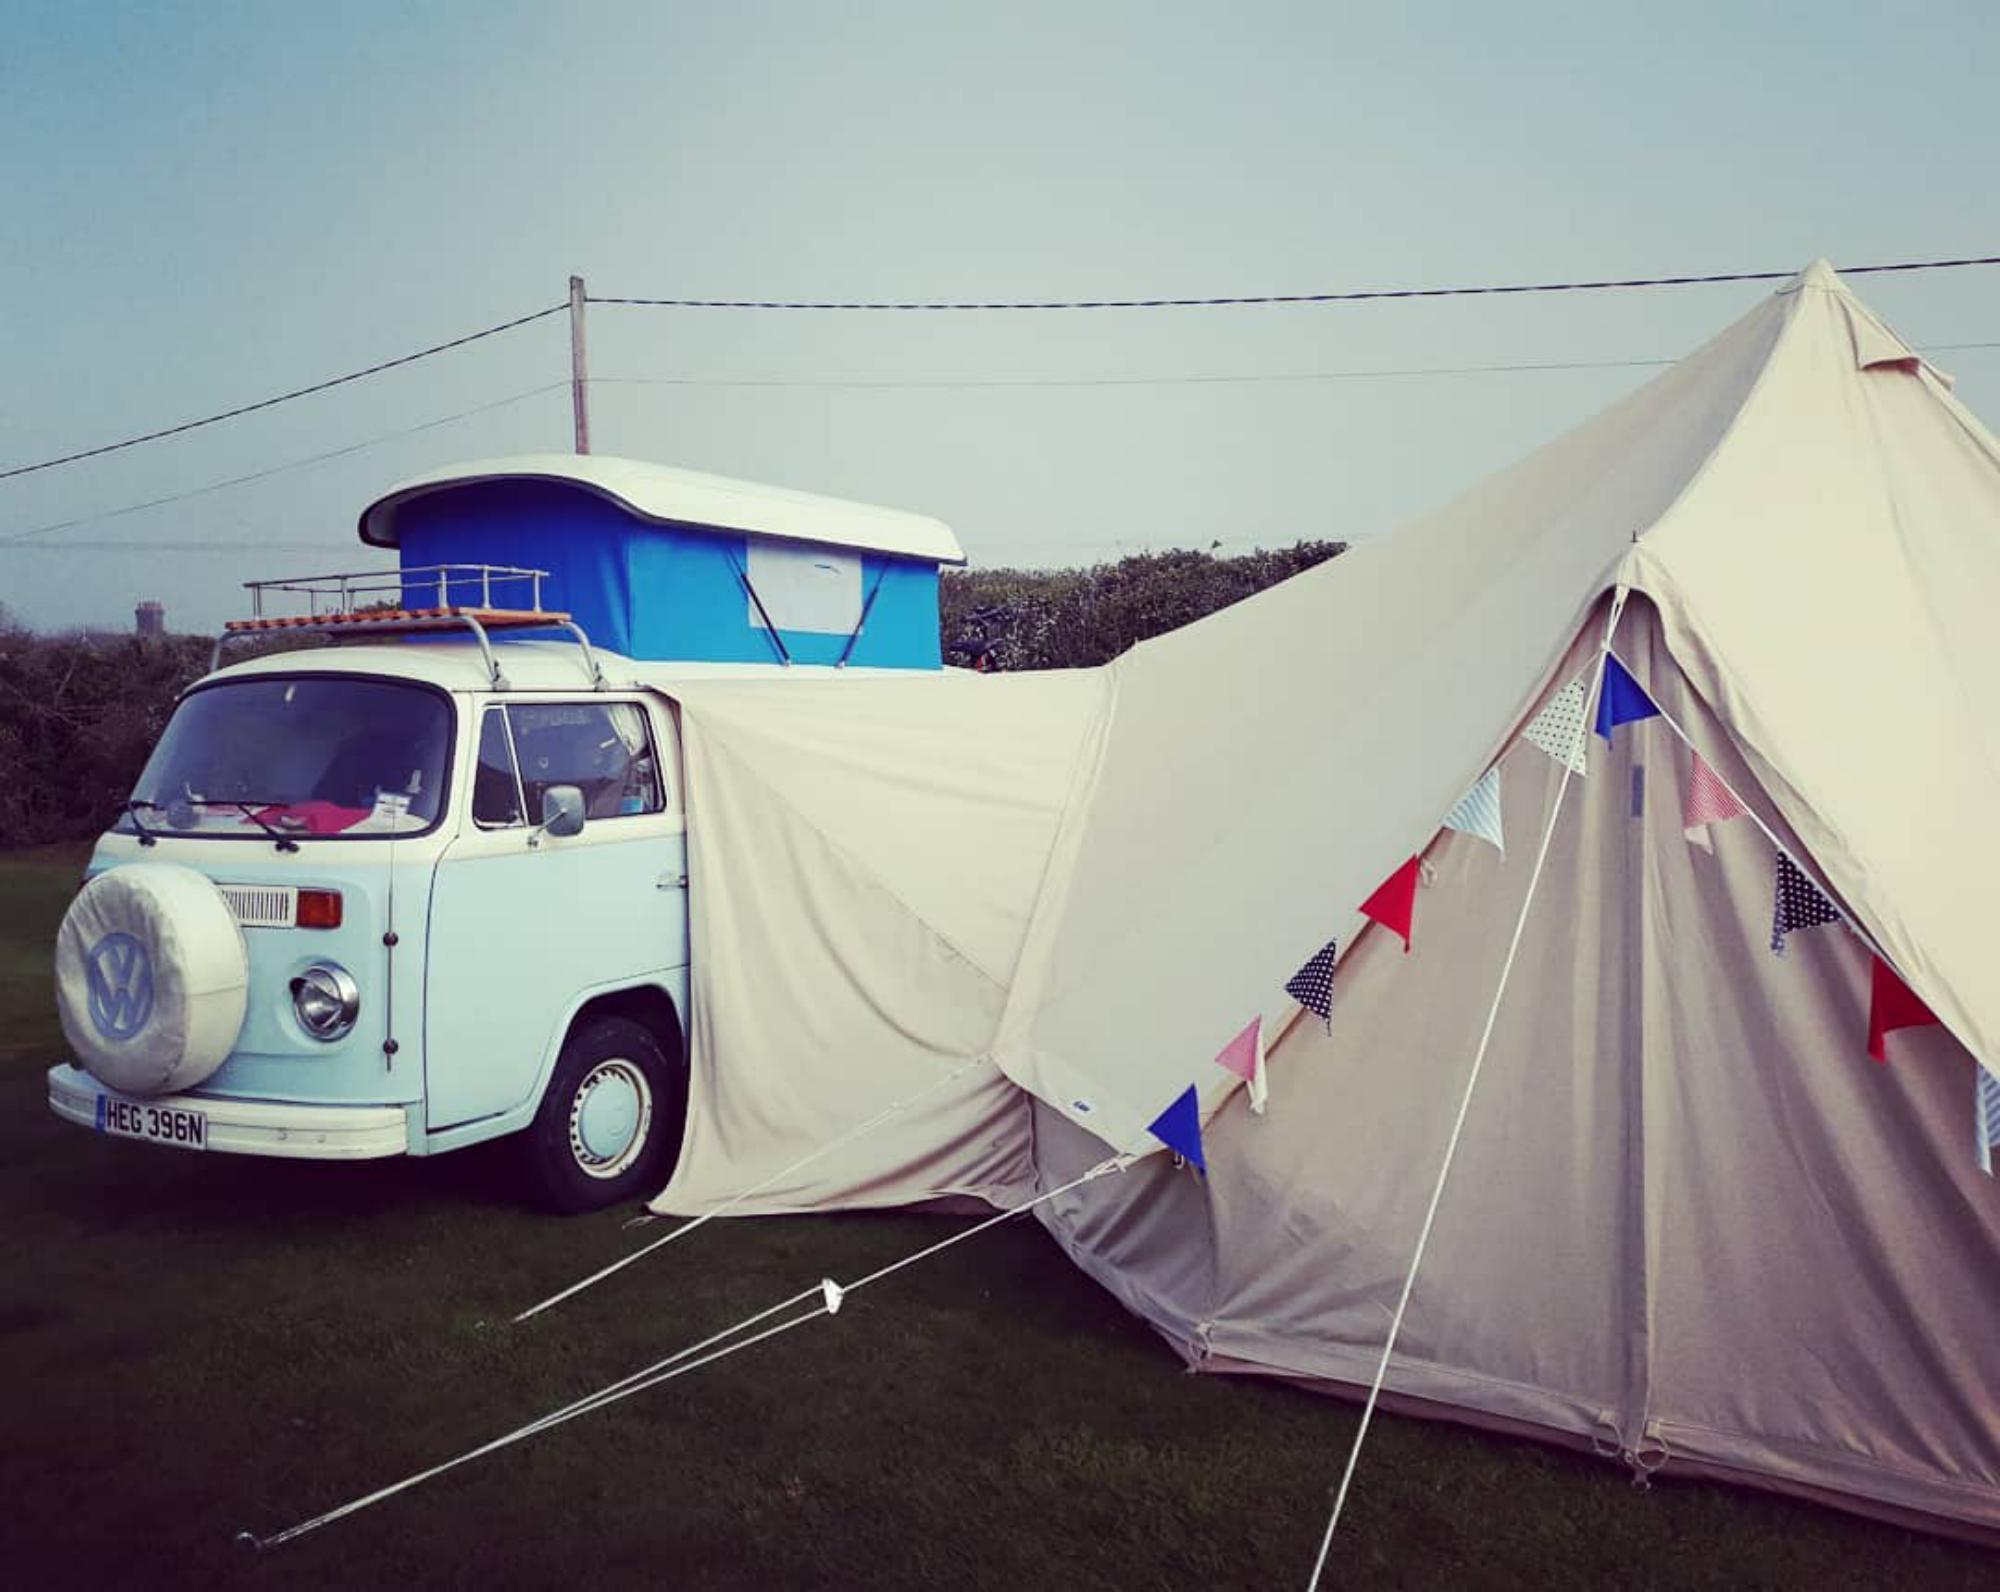 Campervan Hire and Motorhome Rental in Brighton – Cool Camping